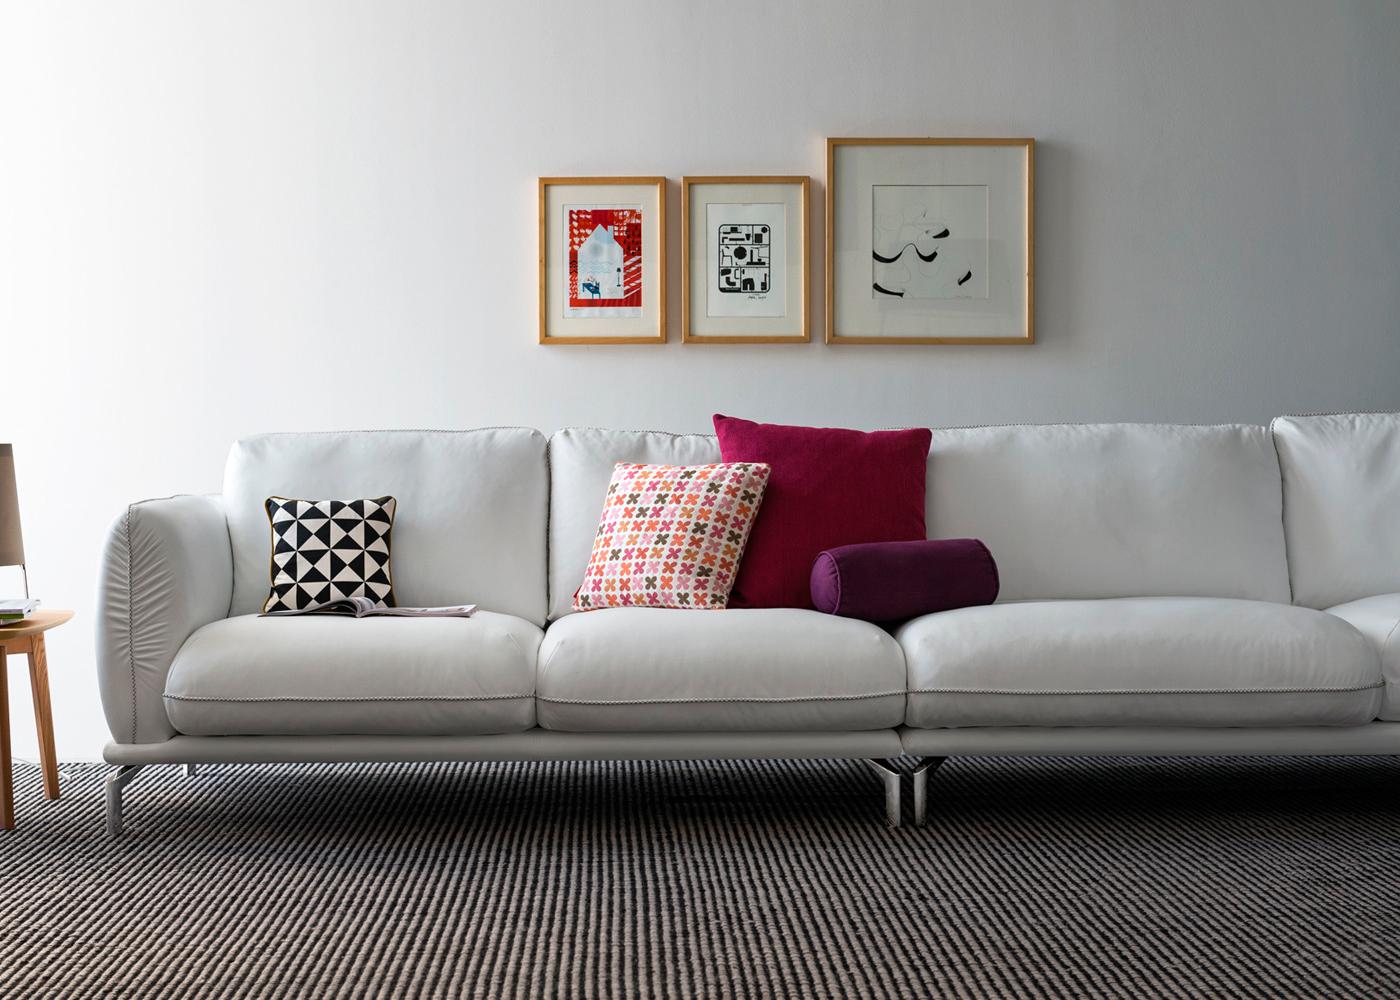 calligaris sofas uk helmond sport sc telstar sofascore taylor midfurn furniture superstore